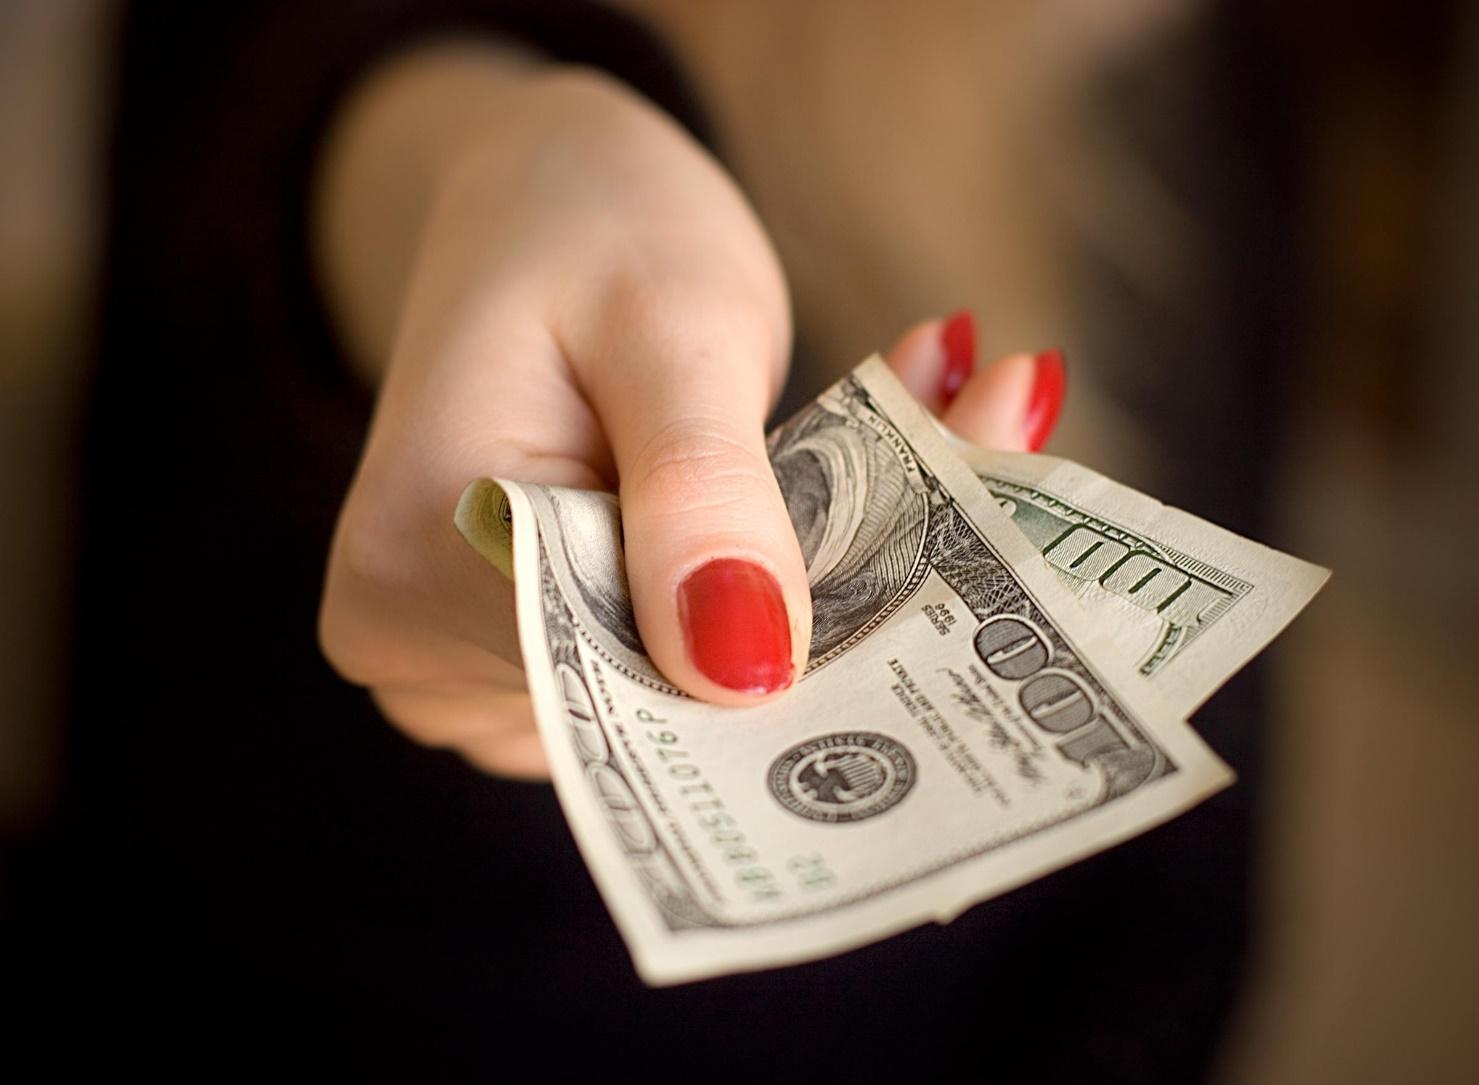 câștigați mulți bani sincer)